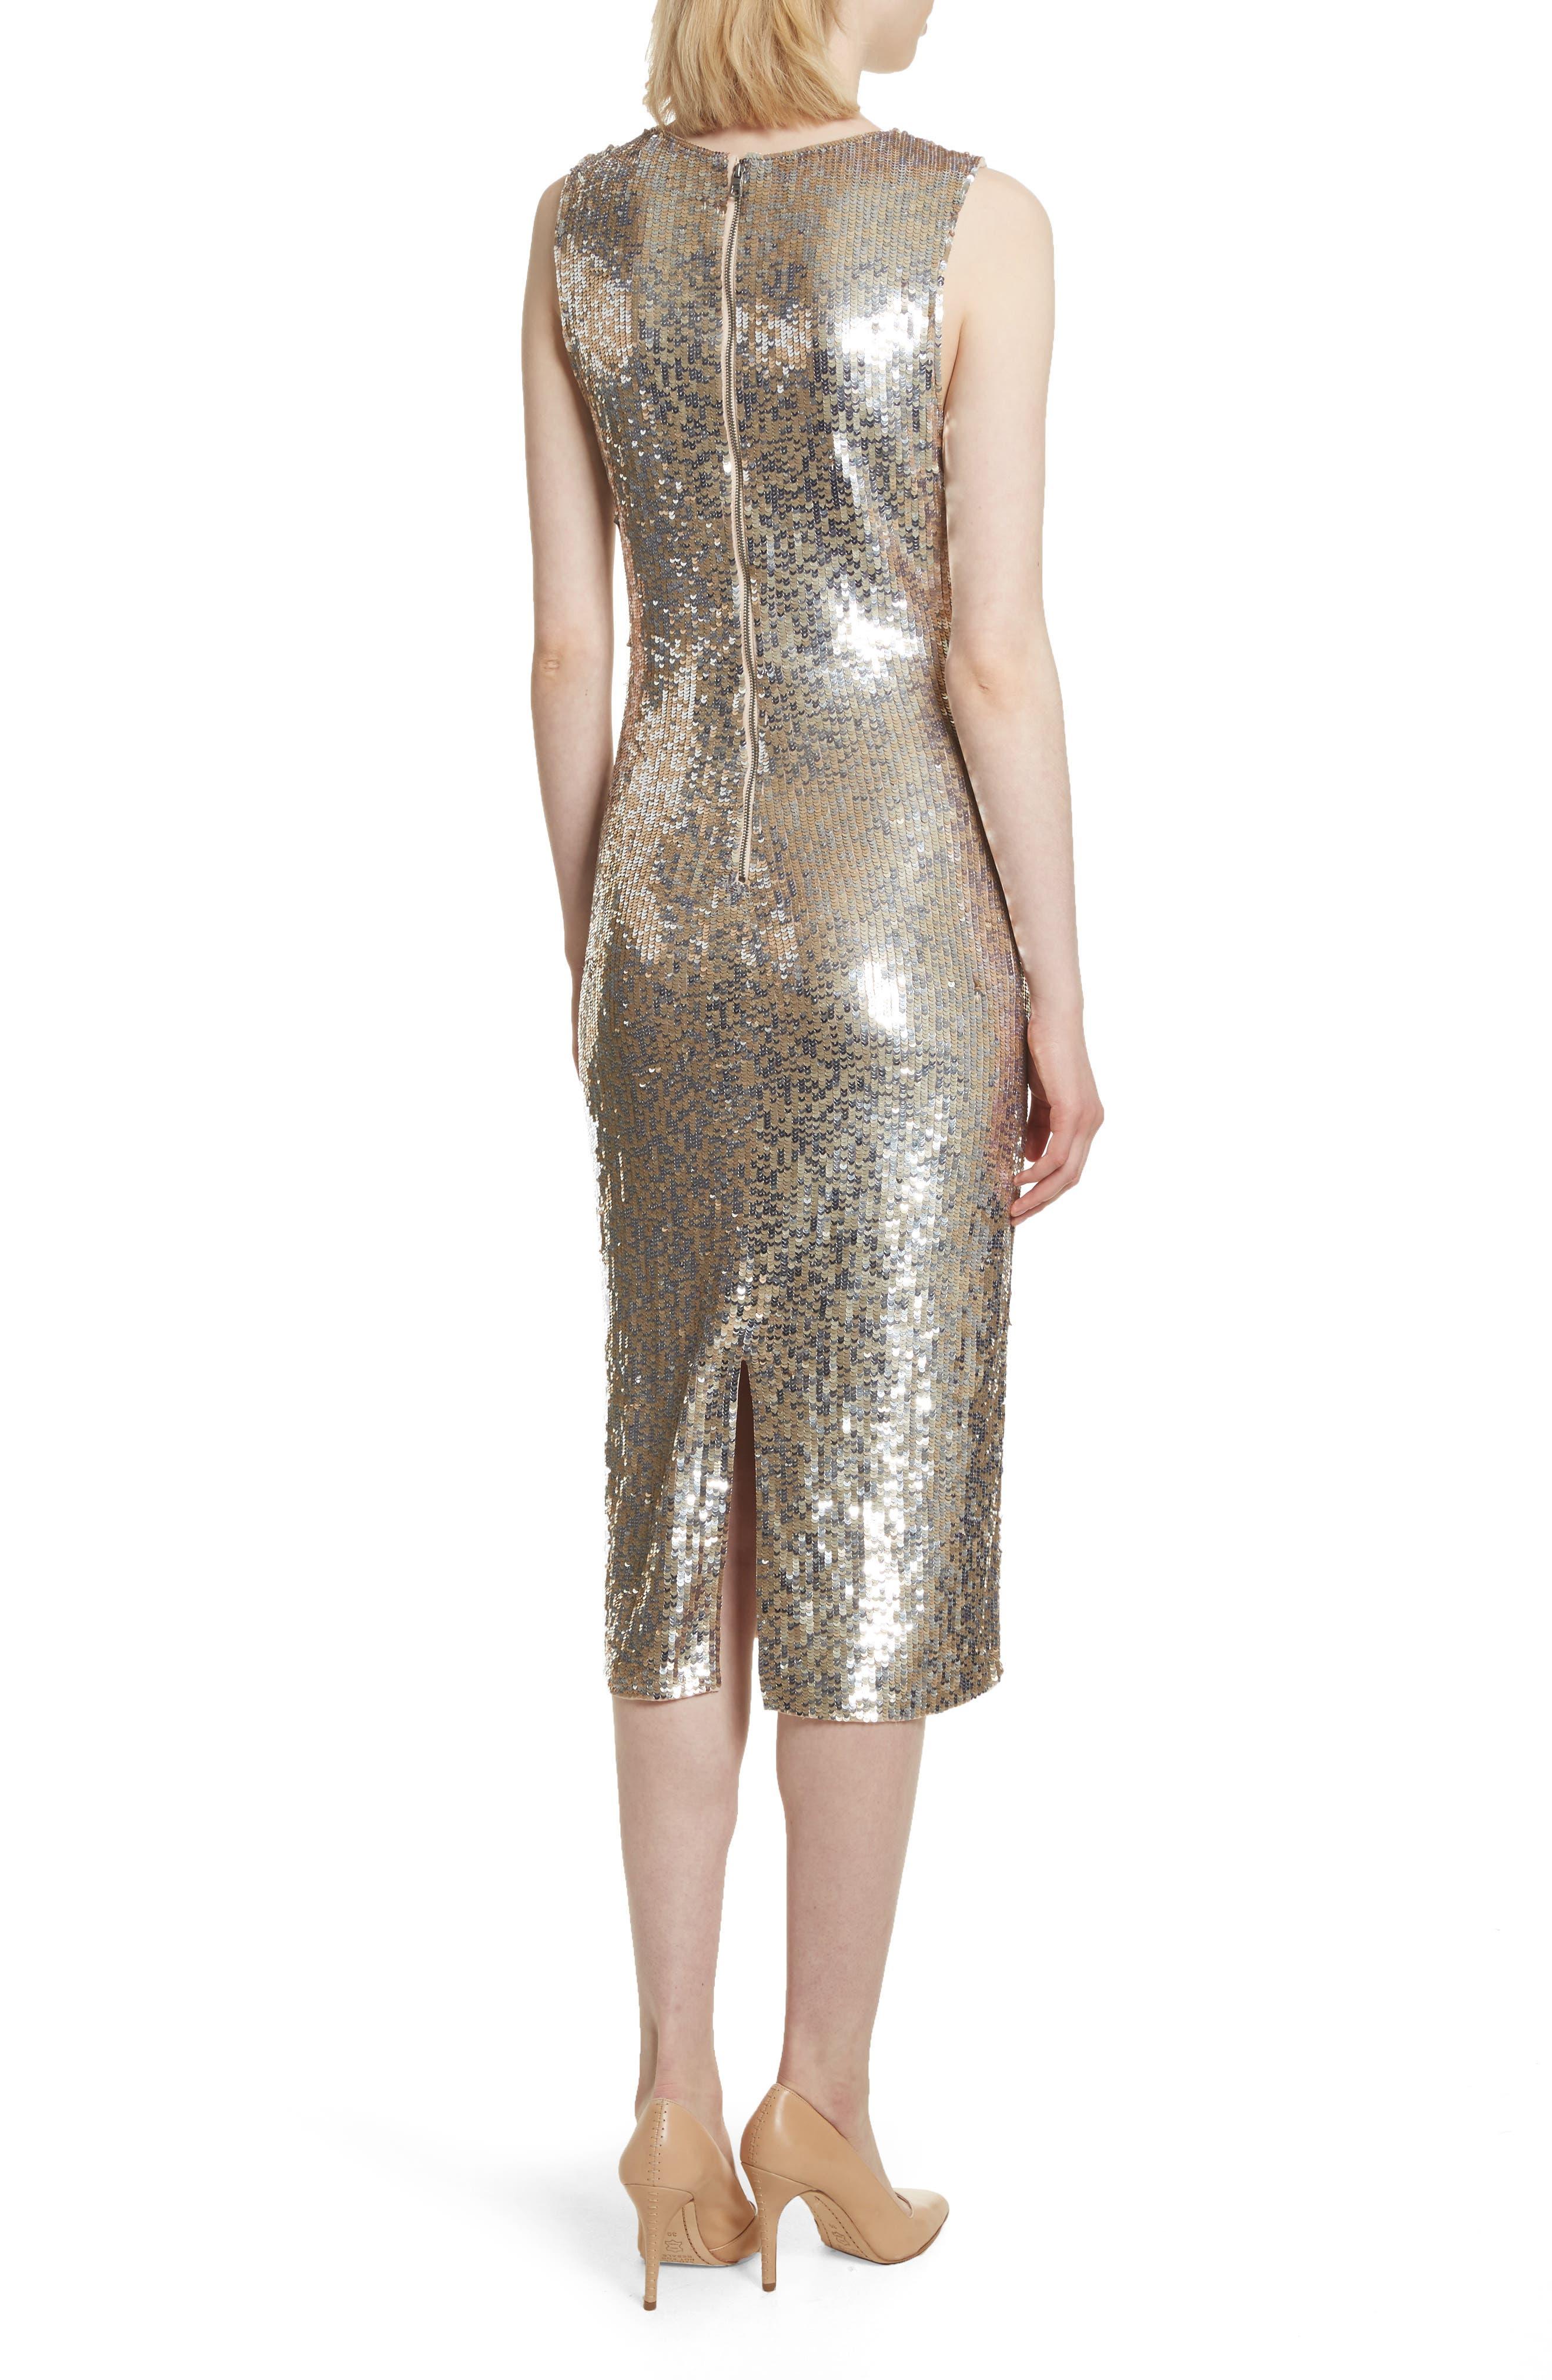 Nat Embellished Sheath Dress,                             Alternate thumbnail 2, color,                             047